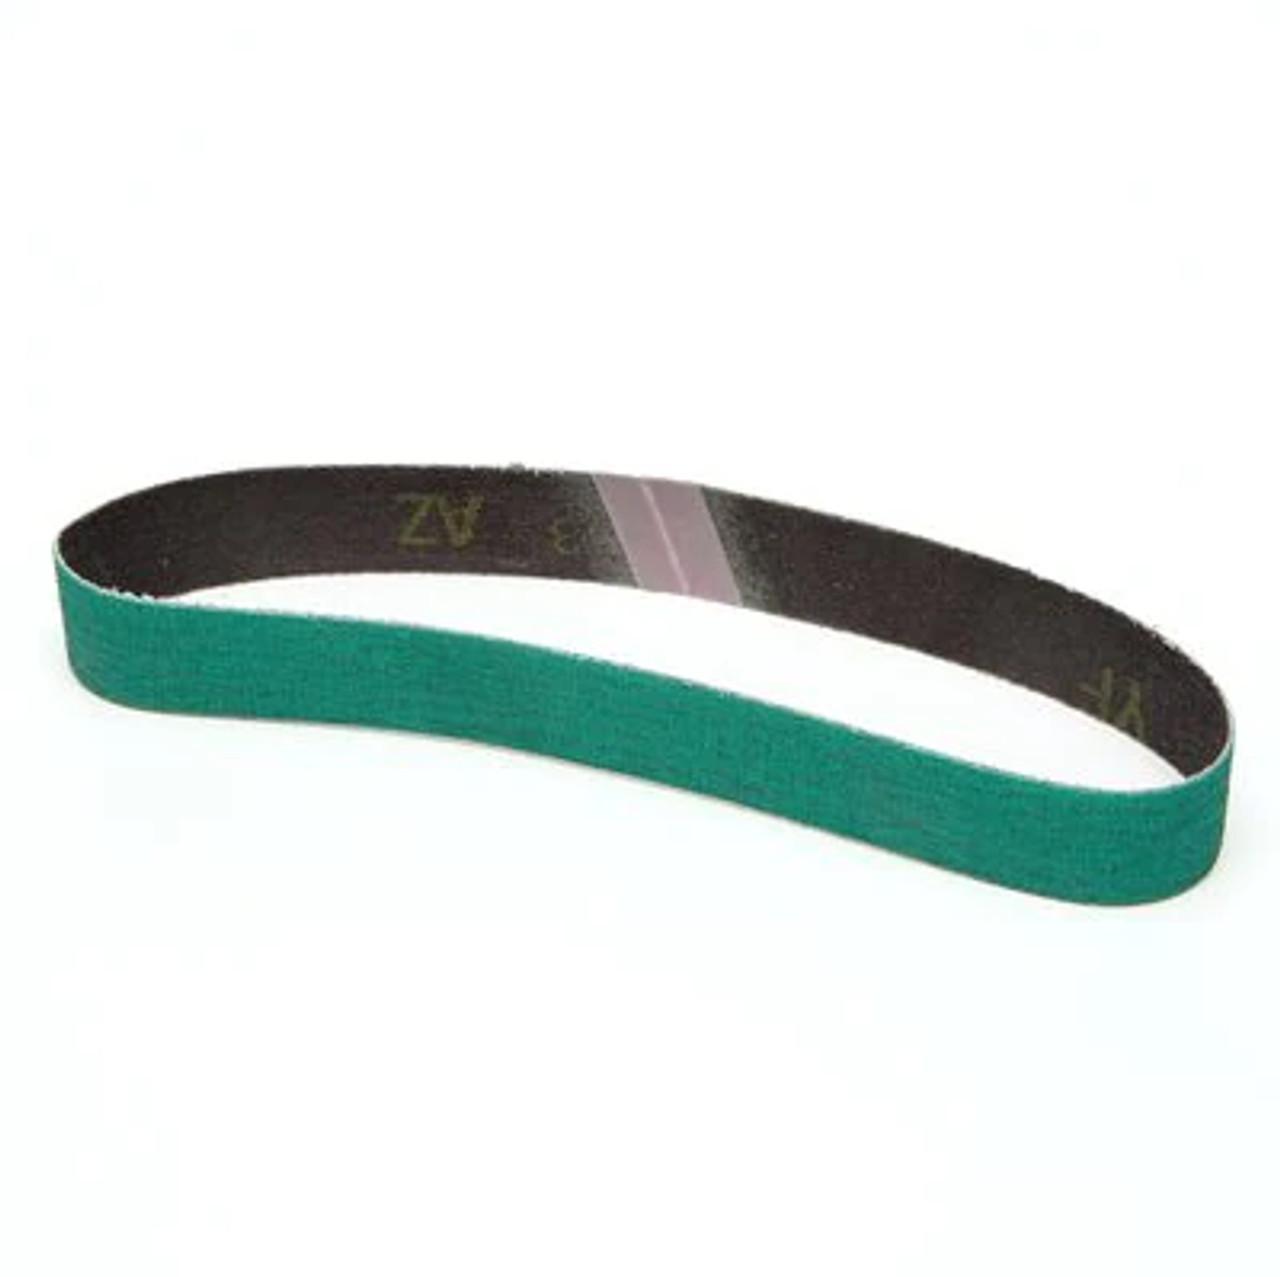 3M™ Cloth Belt 577F, 80 YF-weight, 1/2 in x 18 in, Fabri-lok, Full-flex